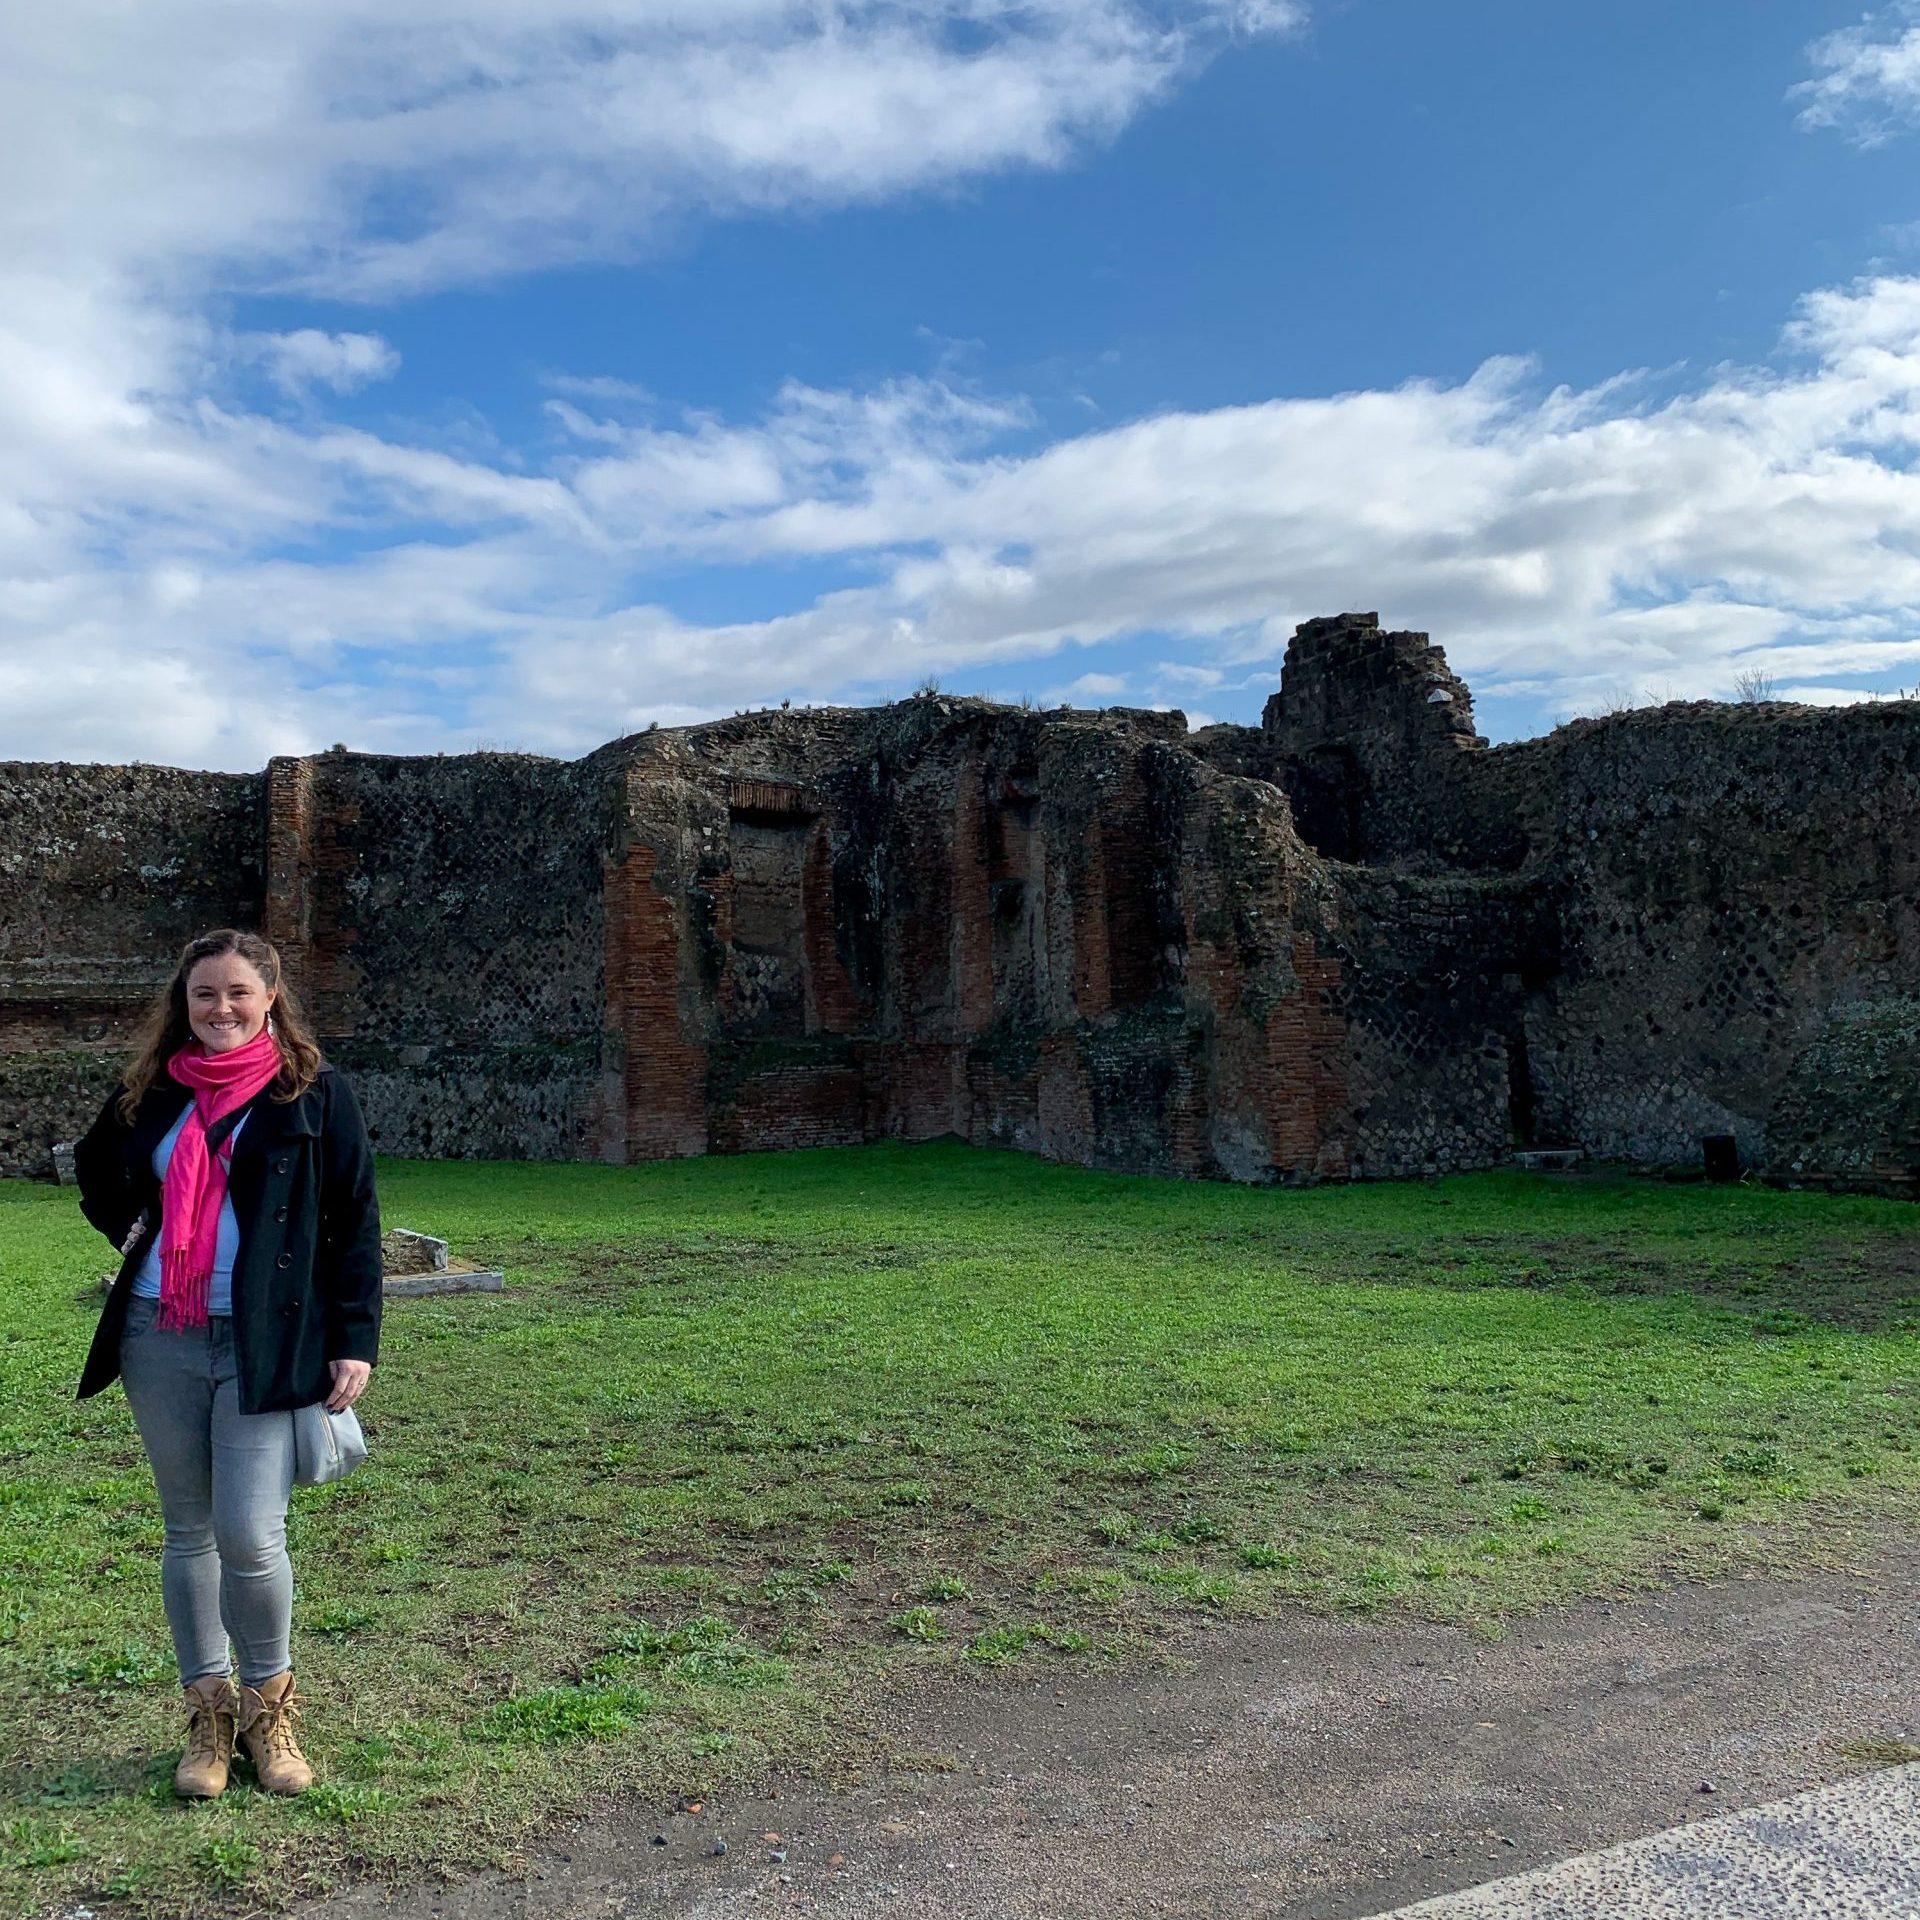 How to plan a trip to Pompeii